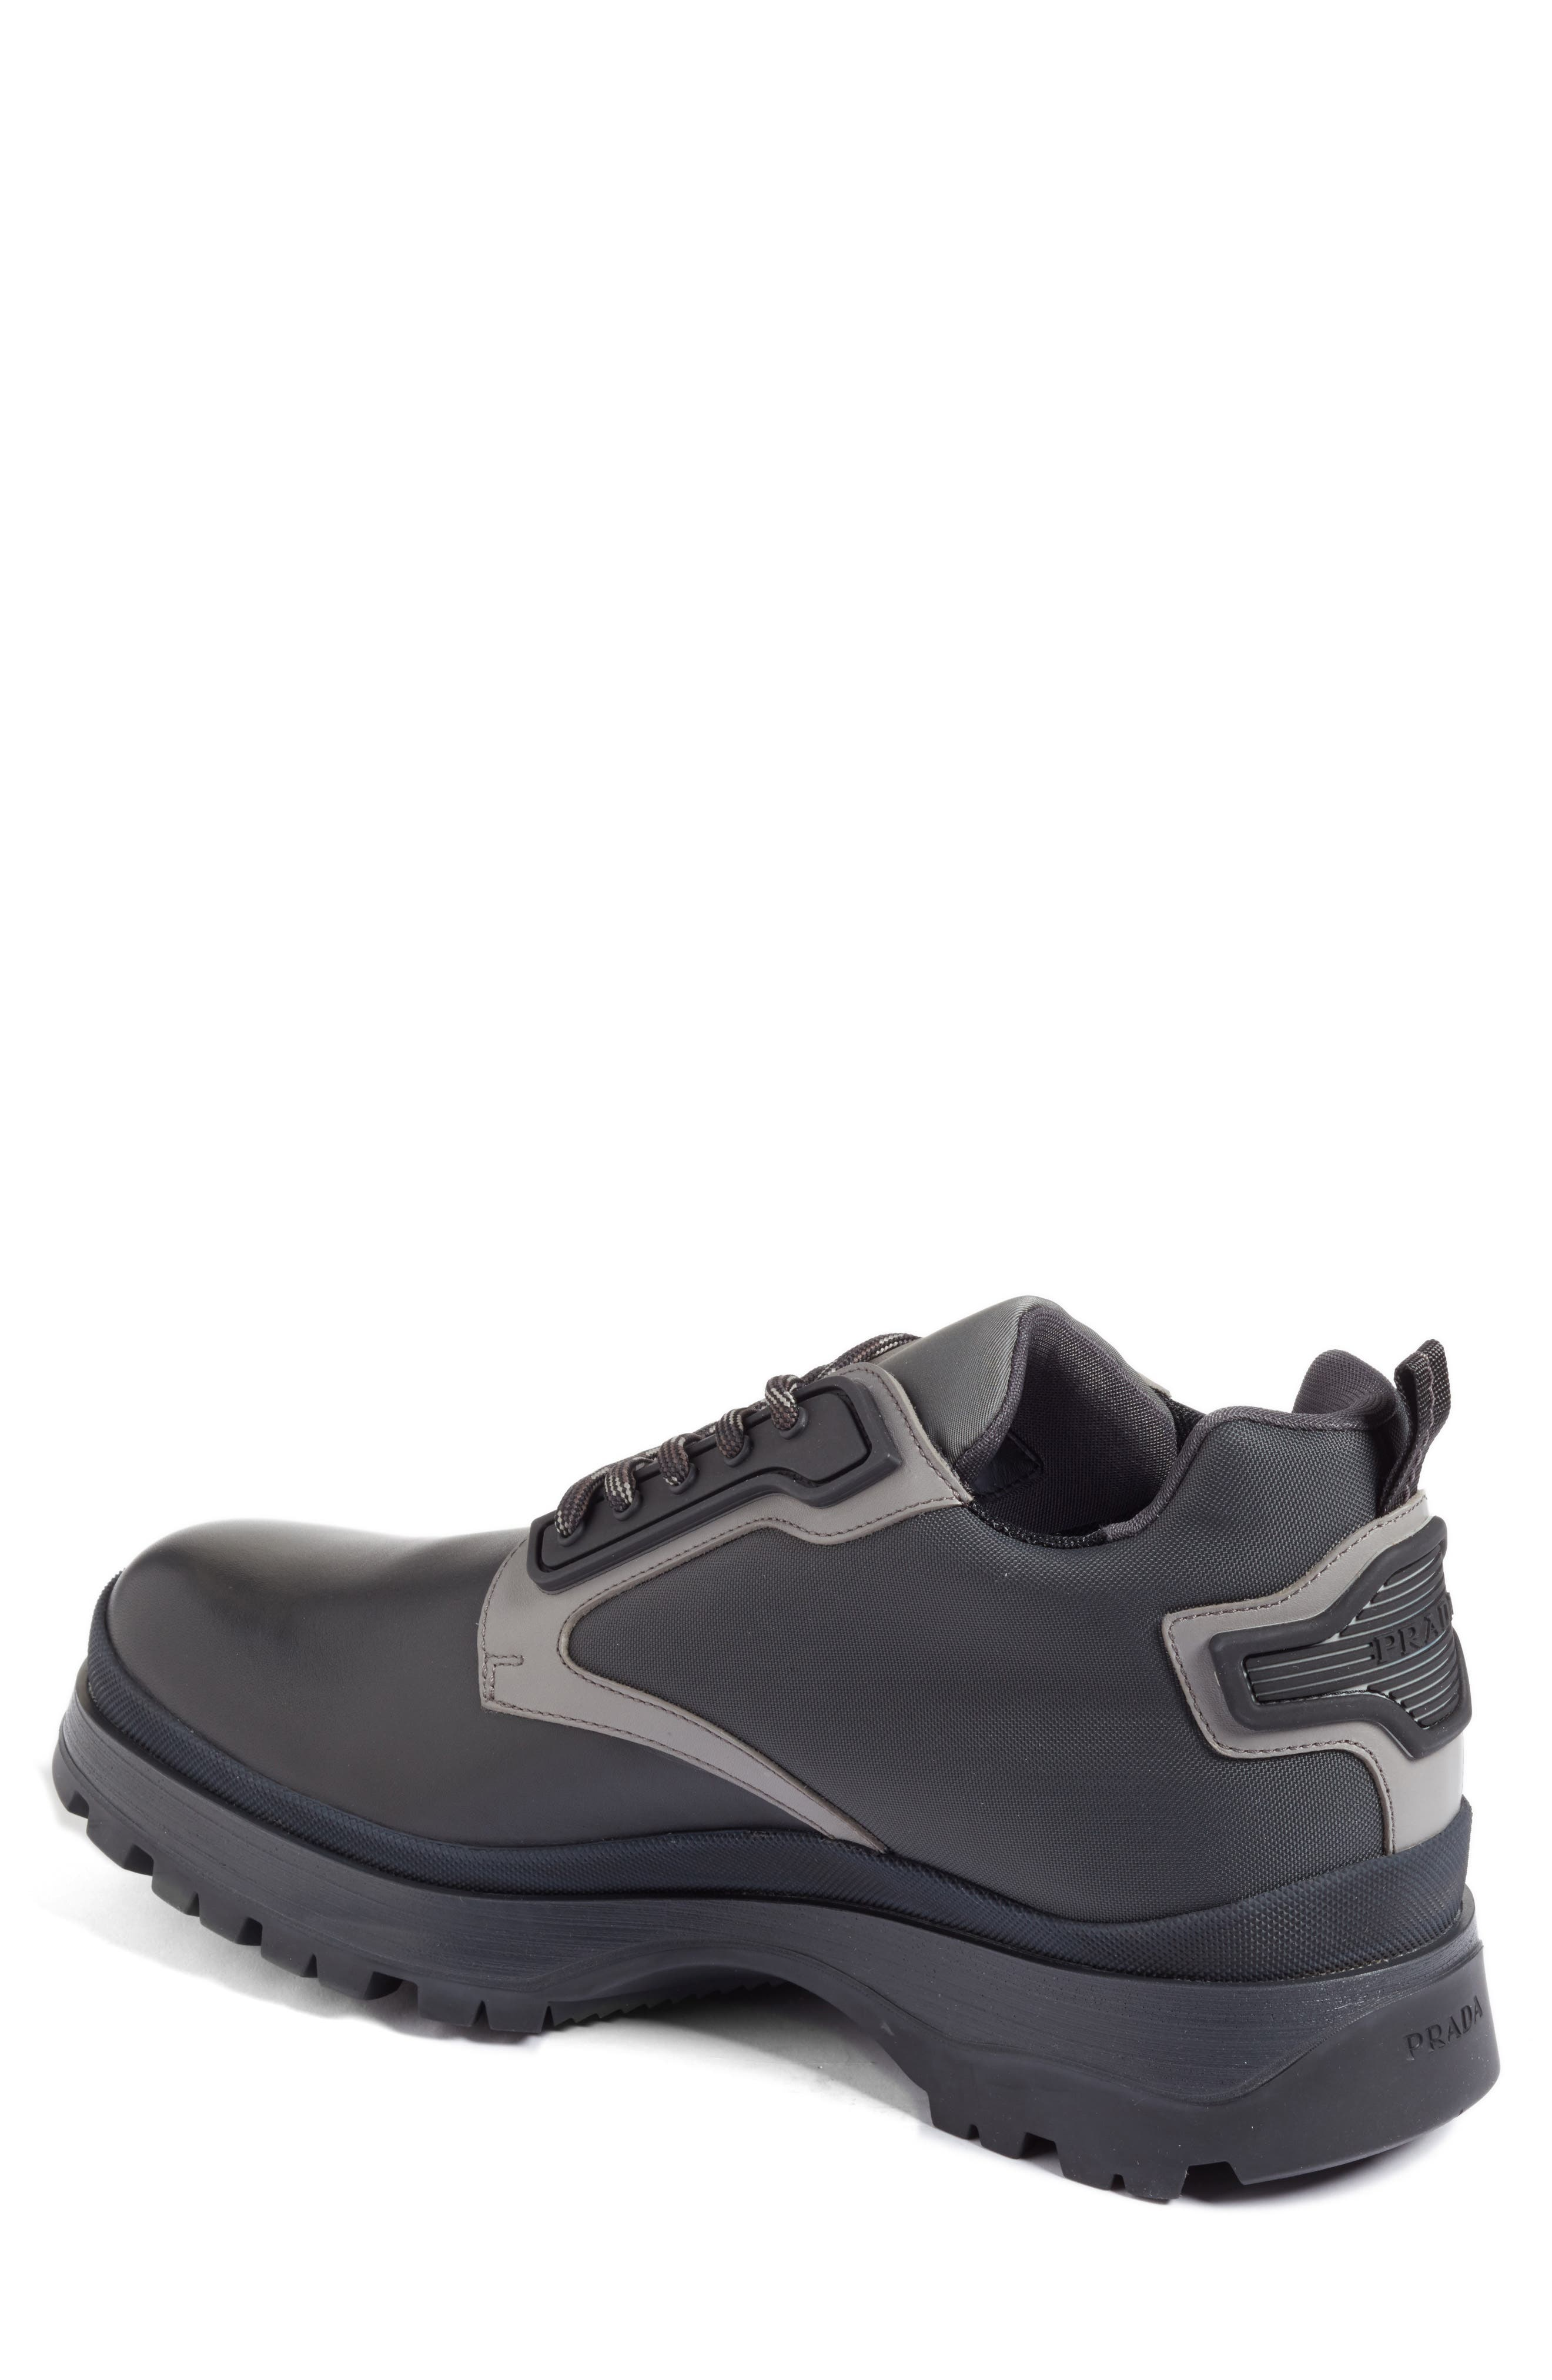 Alternate Image 2  - Prada Linea Rossa Tech Sneaker Boot (Men)